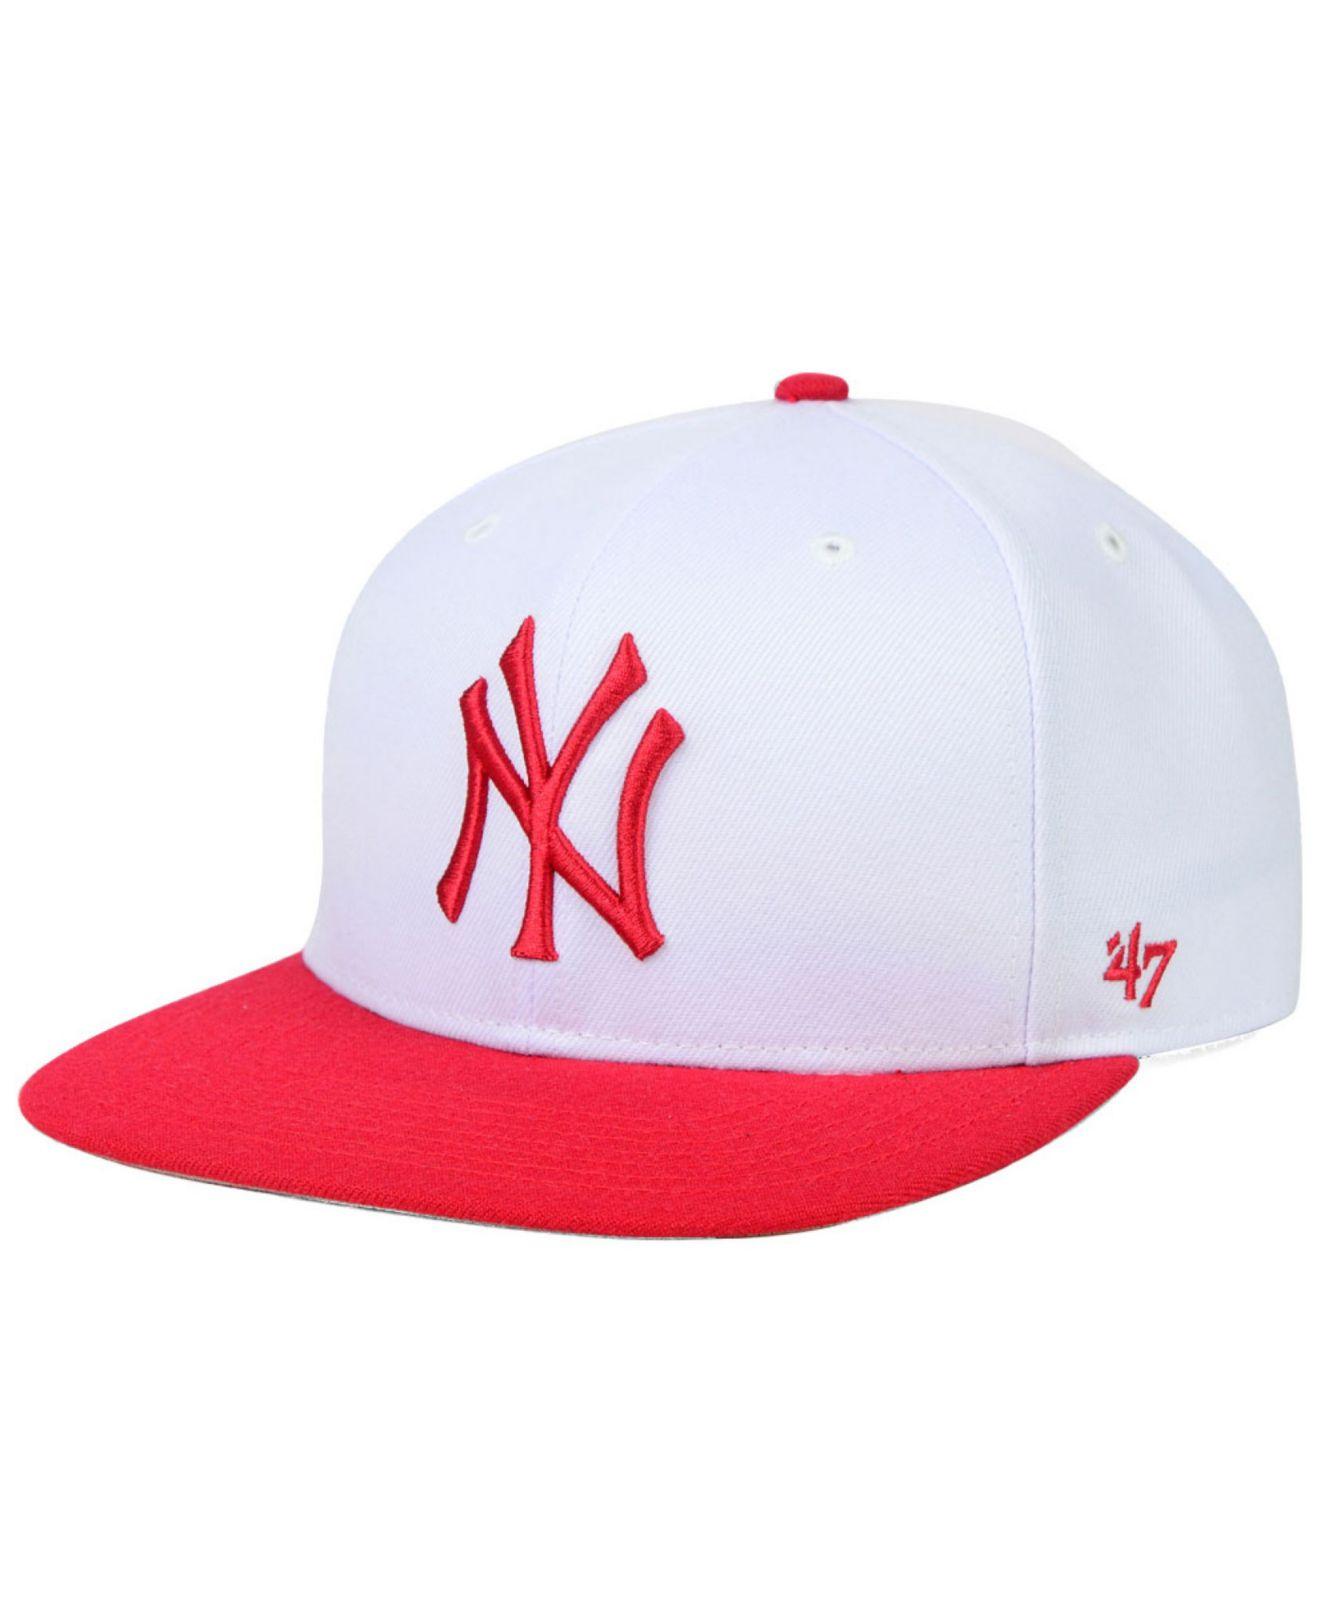 buy online 44067 140bf Lyst - 47 Brand New York Yankees Sure Shot Snapback Cap in White for Men